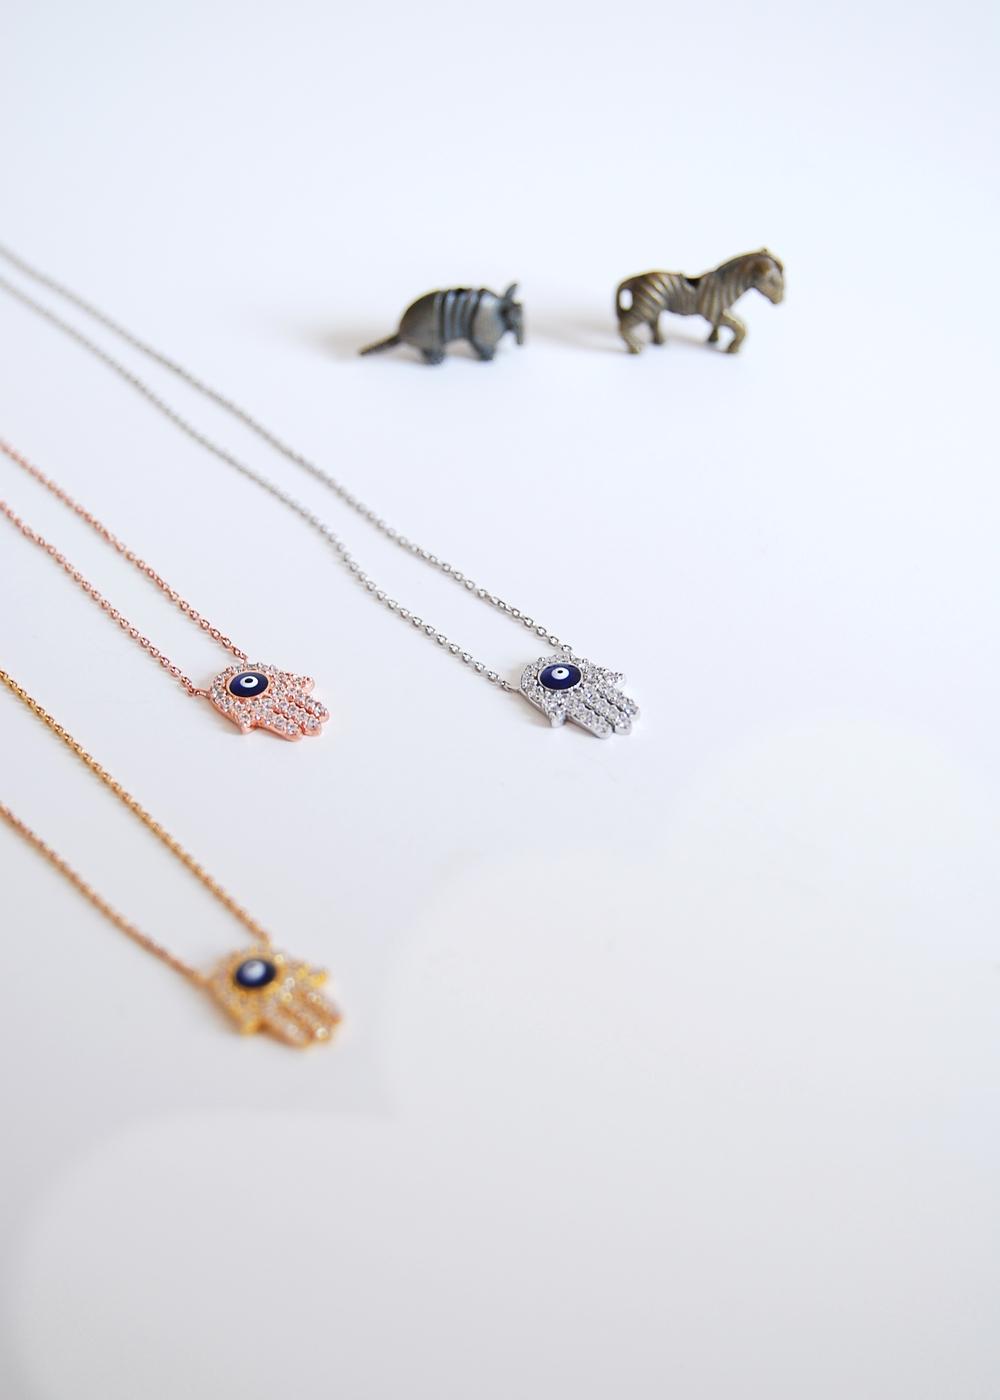 Hamsa + Evil Eye necklaces